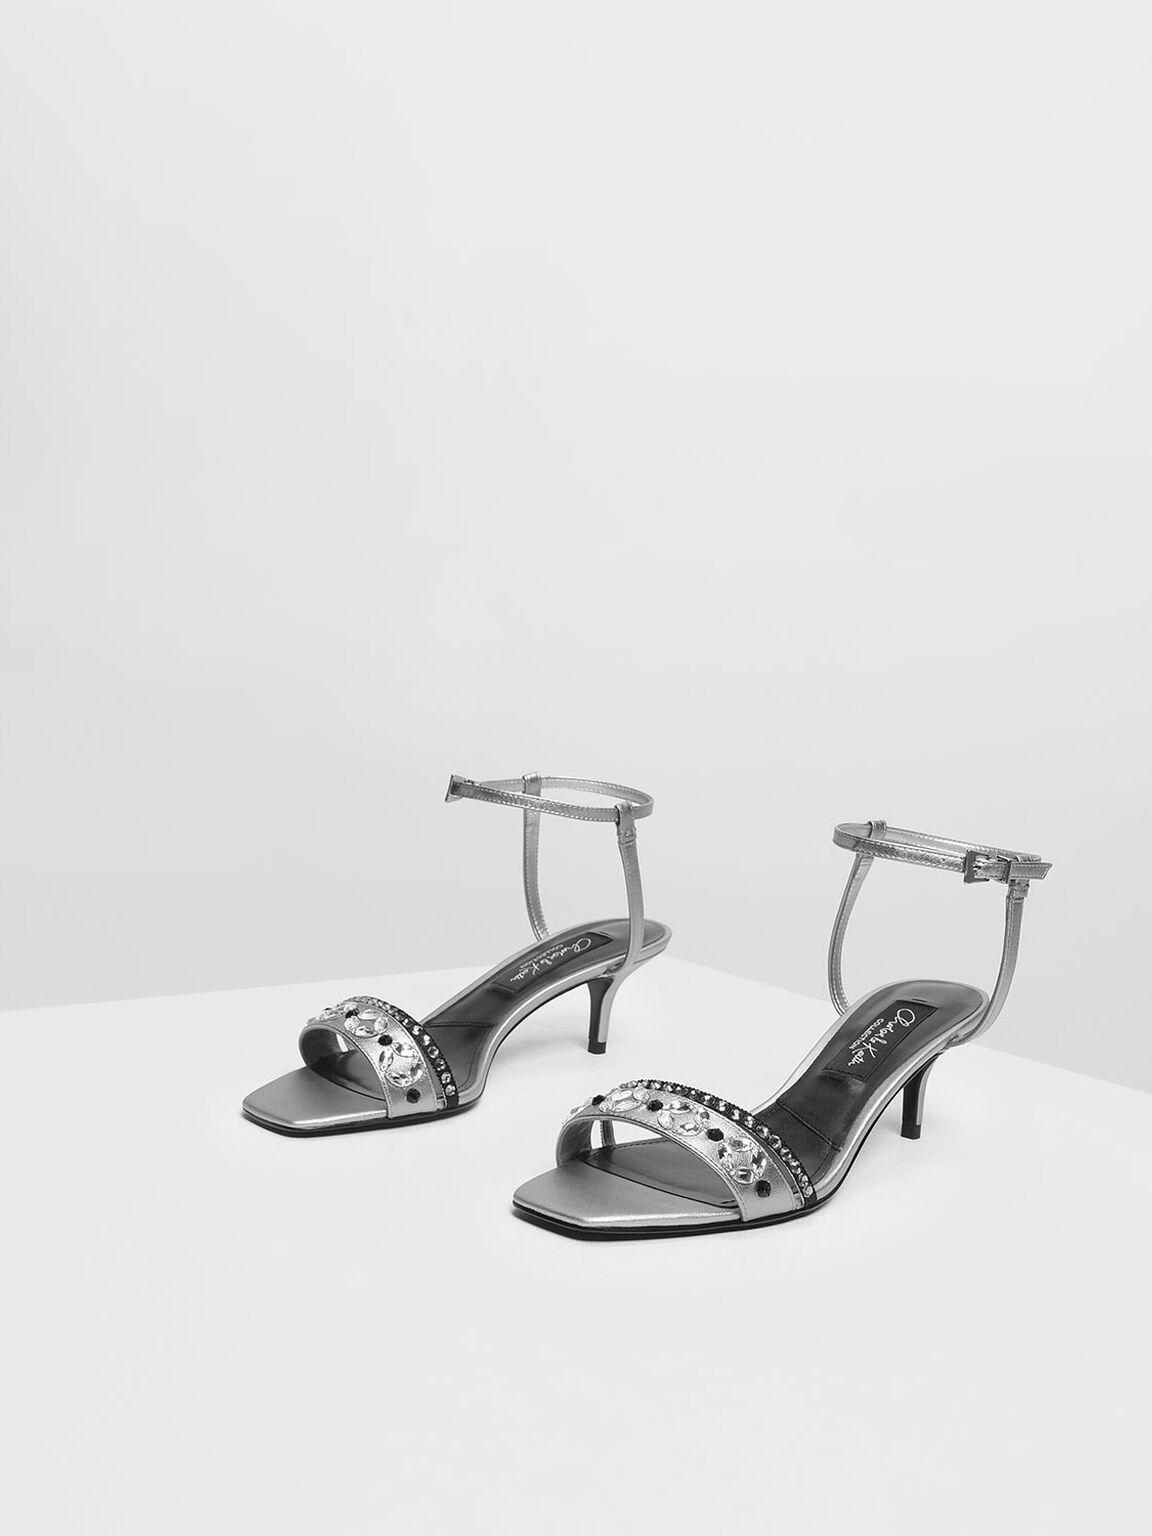 Leather Bedazzled Kitten Heel Sandals, Silver, hi-res